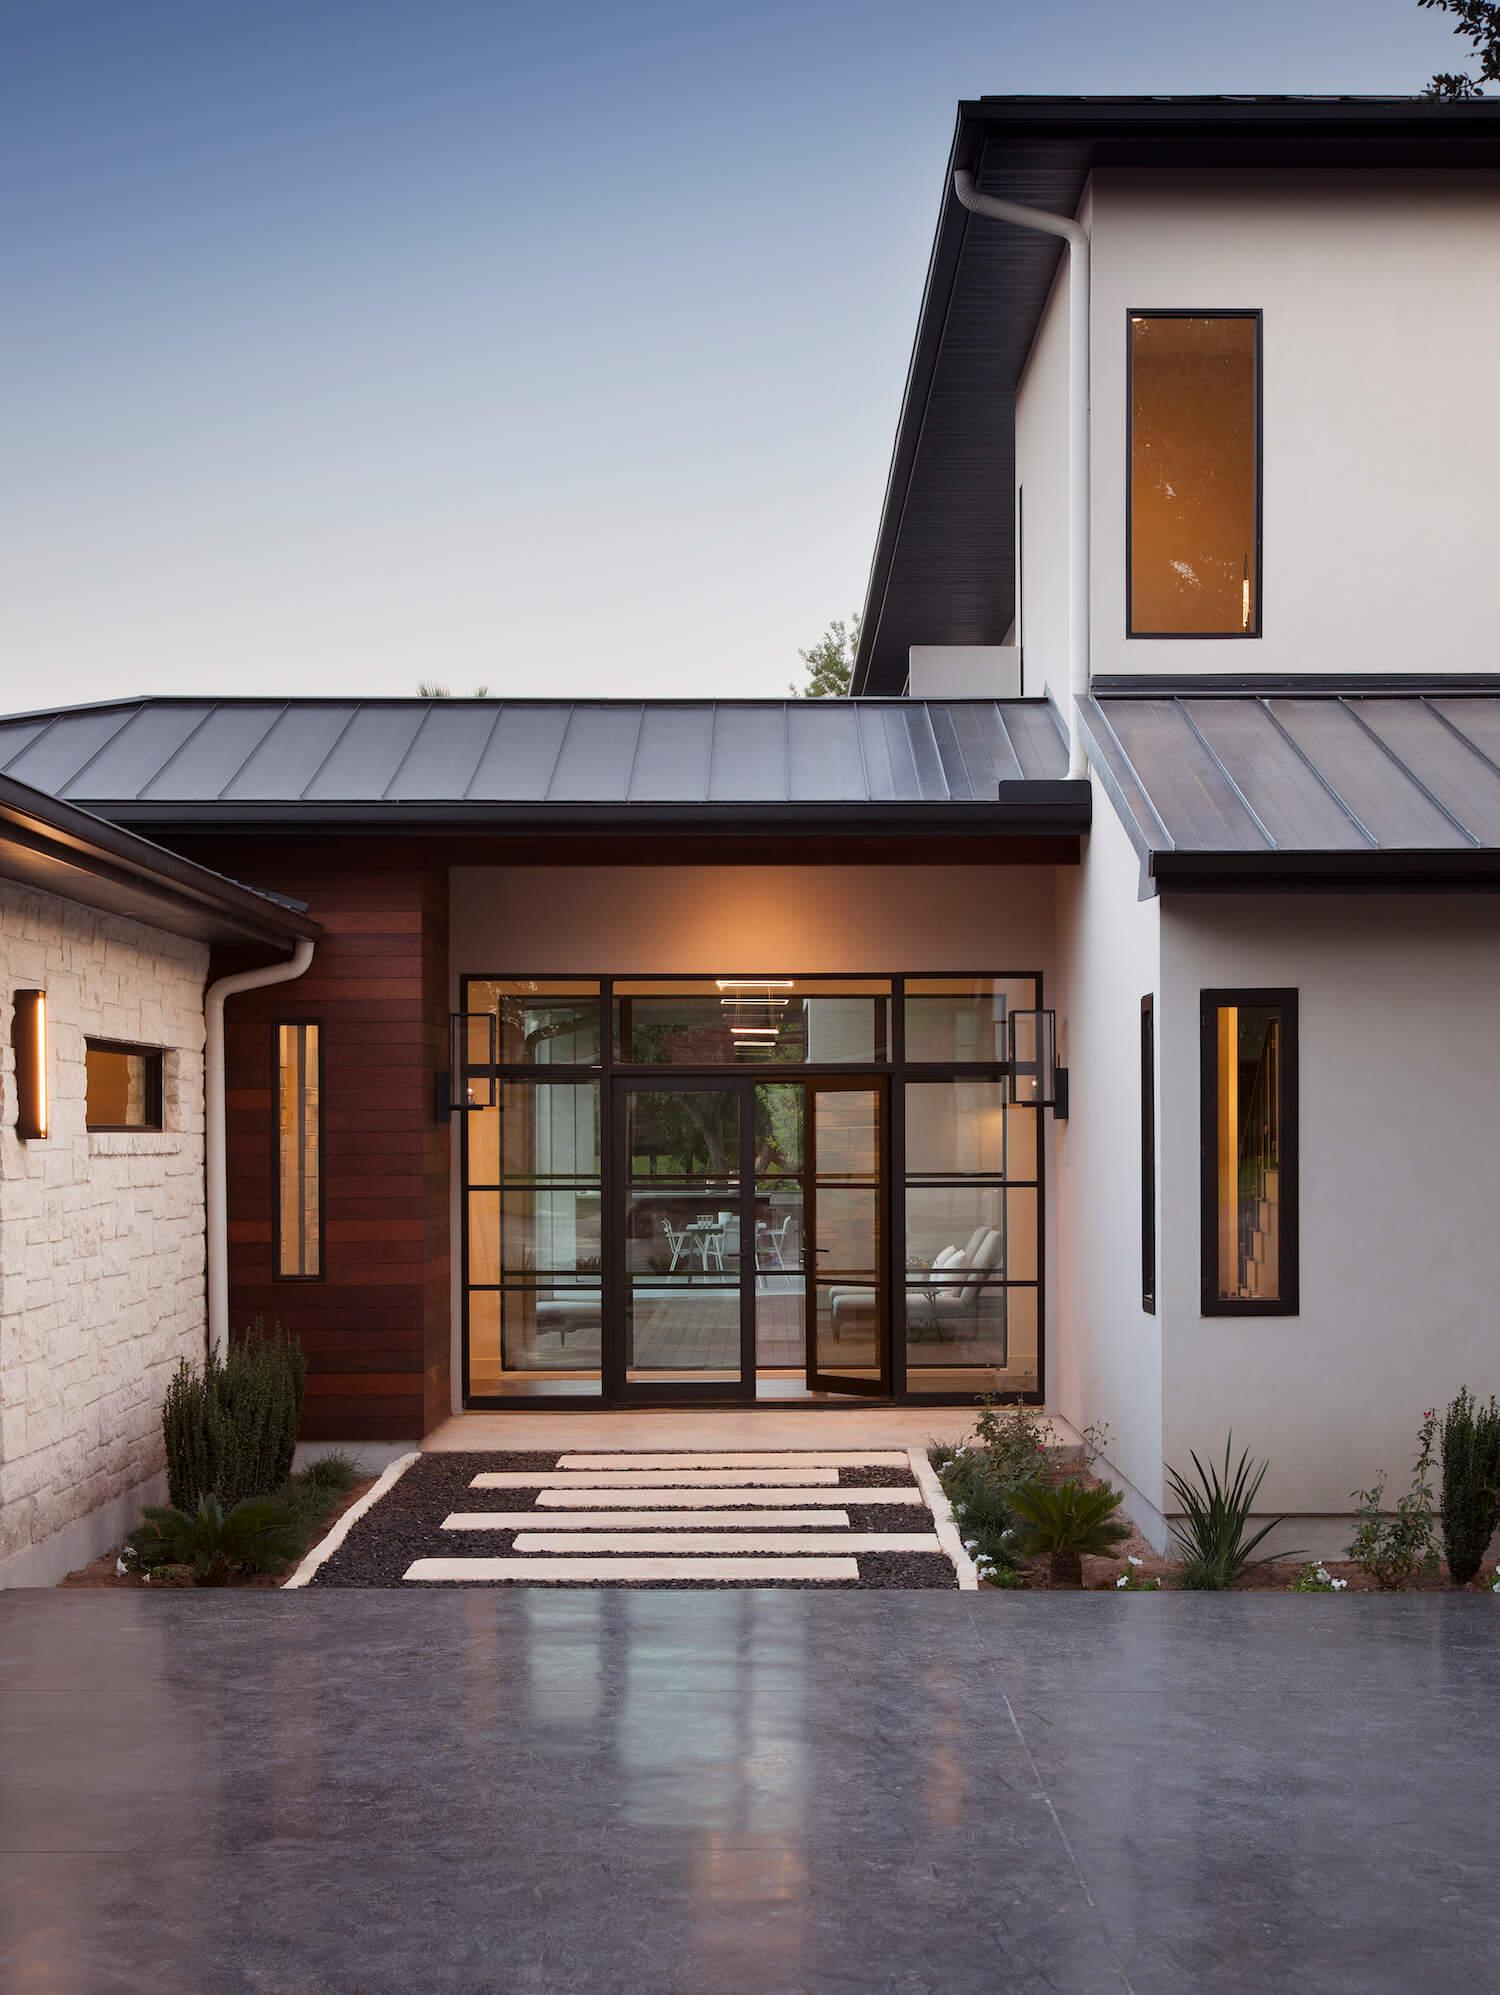 Horseshoe Bay Exterior Entry | Robin Colton Interior Design Studio Austin Texas | www.robincolton.com